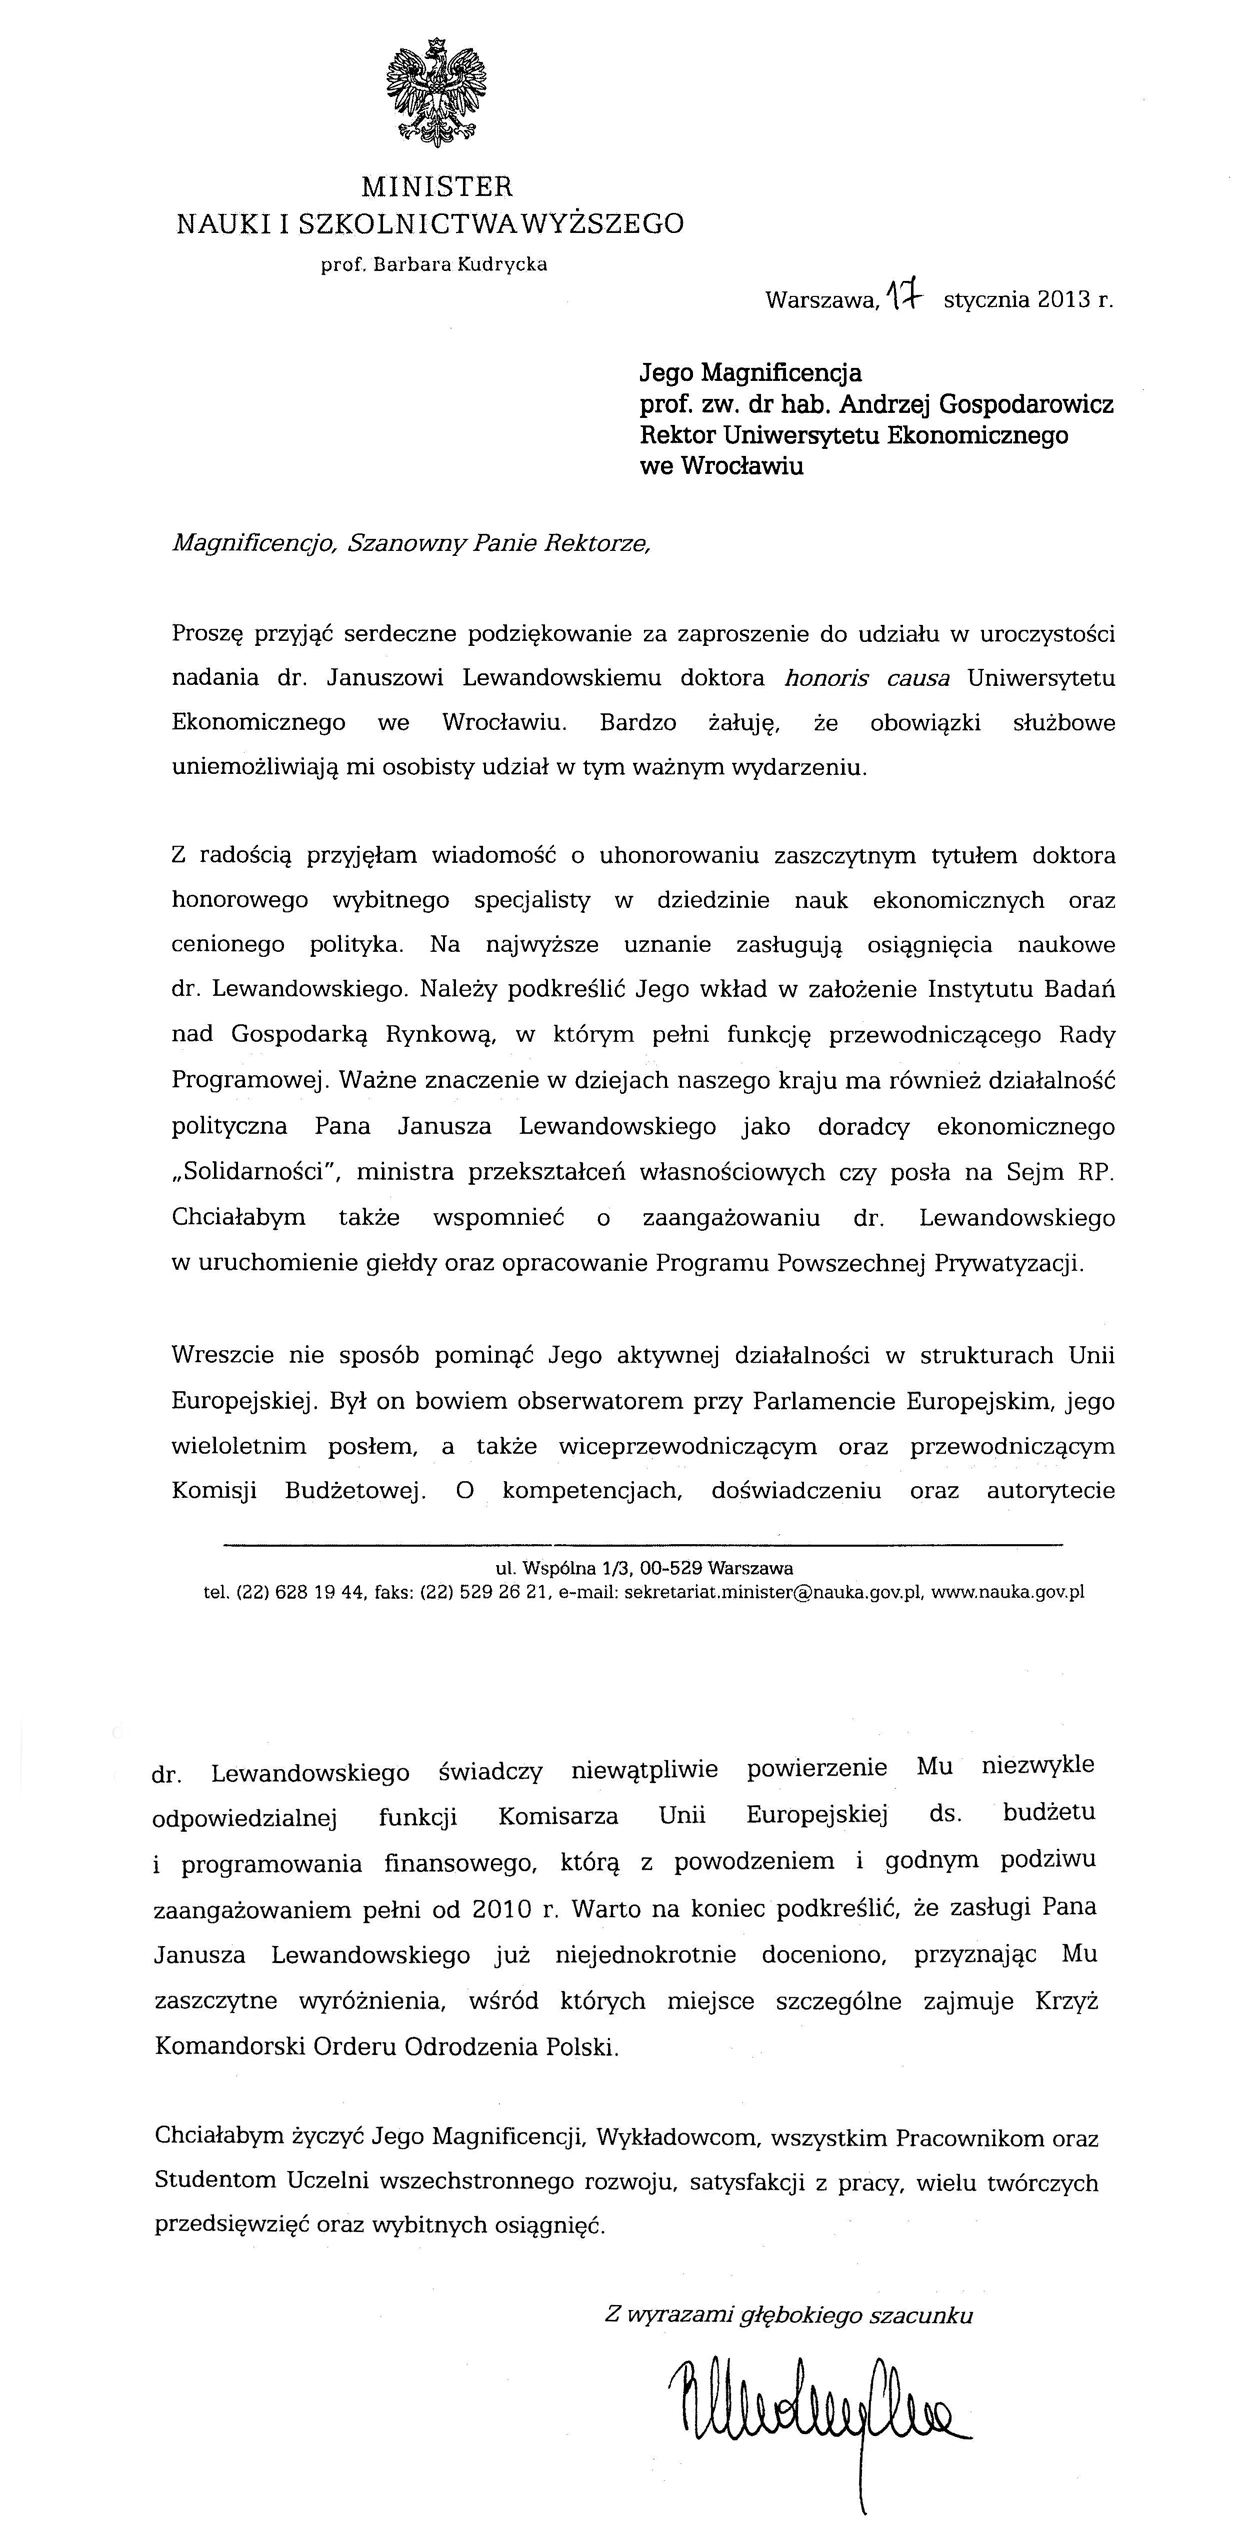 Janusz Lewandowski Doktor Honoris Causa Rok 2013 Aktualności